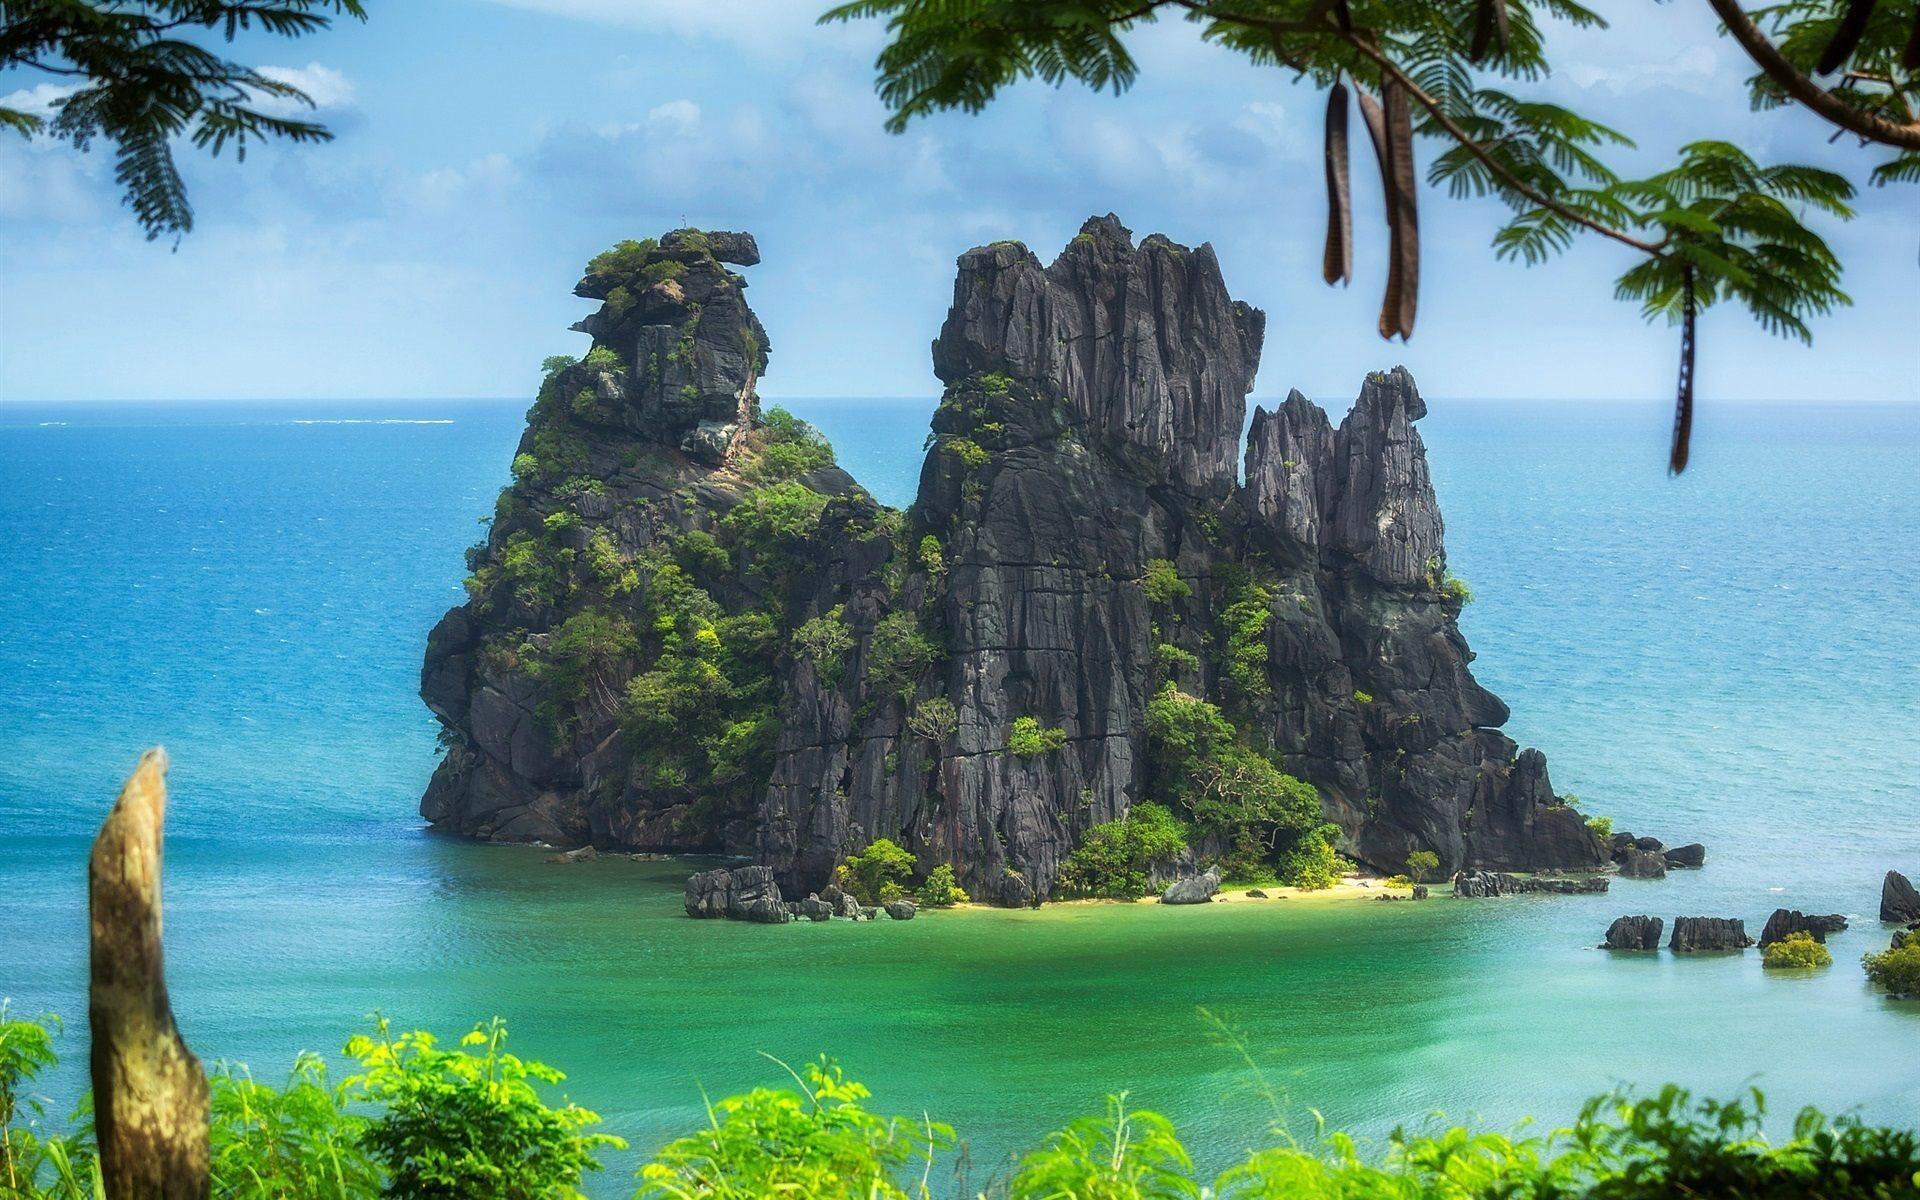 Download wallpapers South Pacific ocean tropics islands New 1920x1200